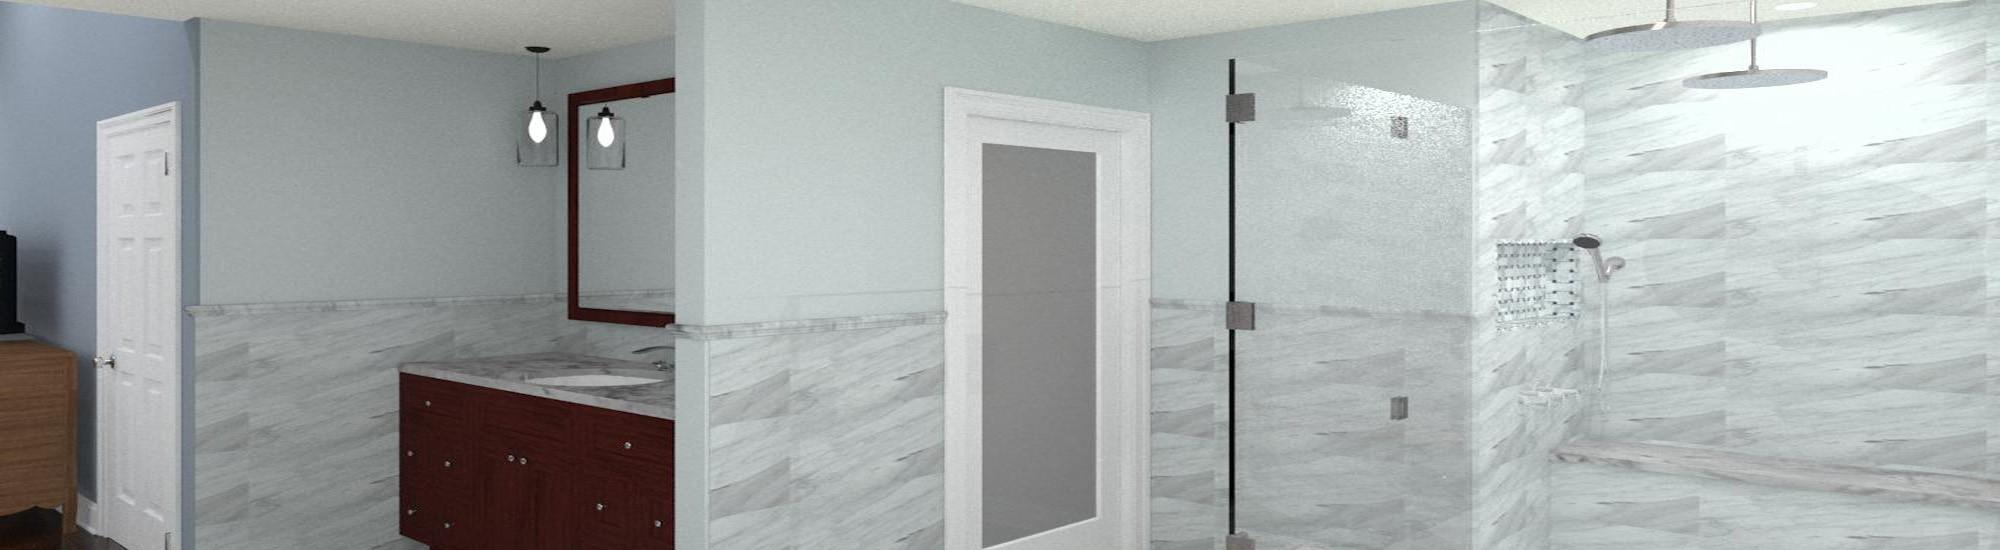 Design Build Pros Bathroom (2)